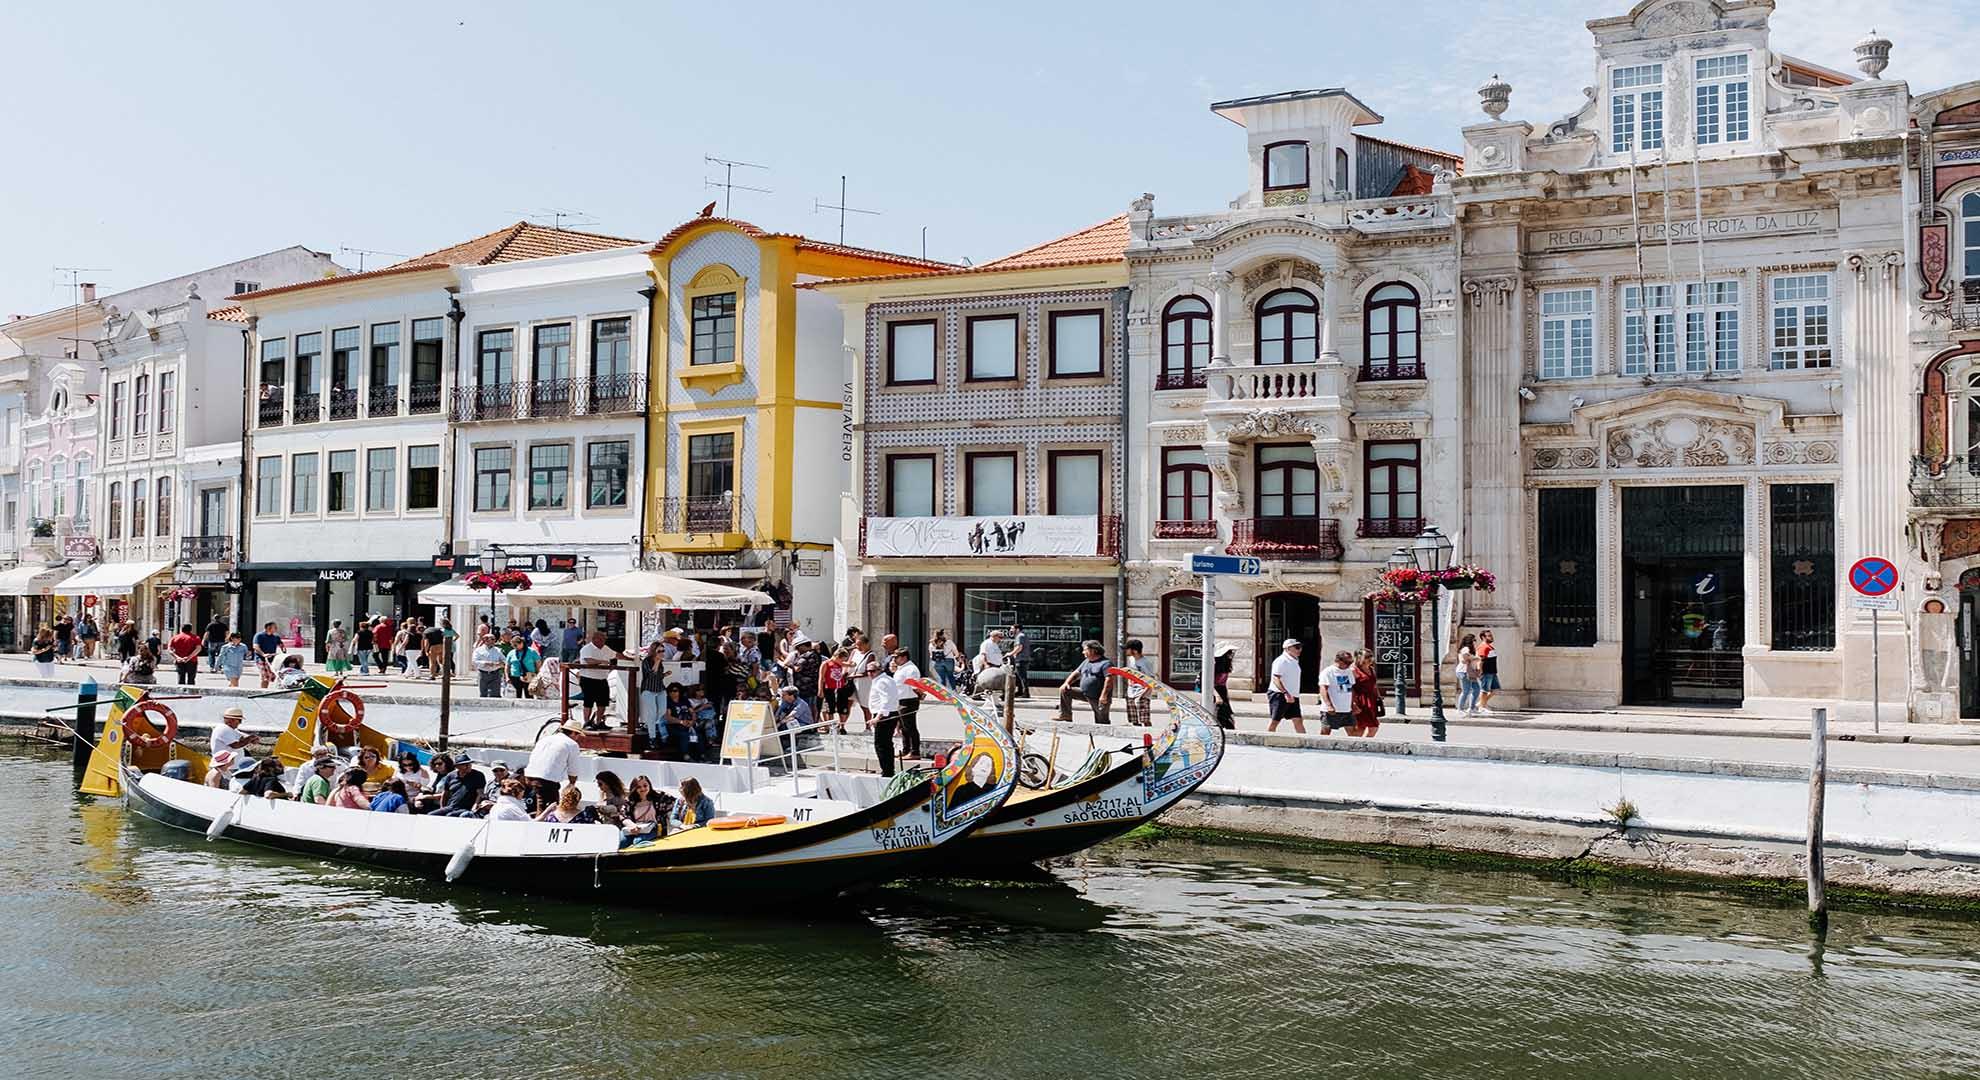 Turismo sostenible en Aveiro, Portugal